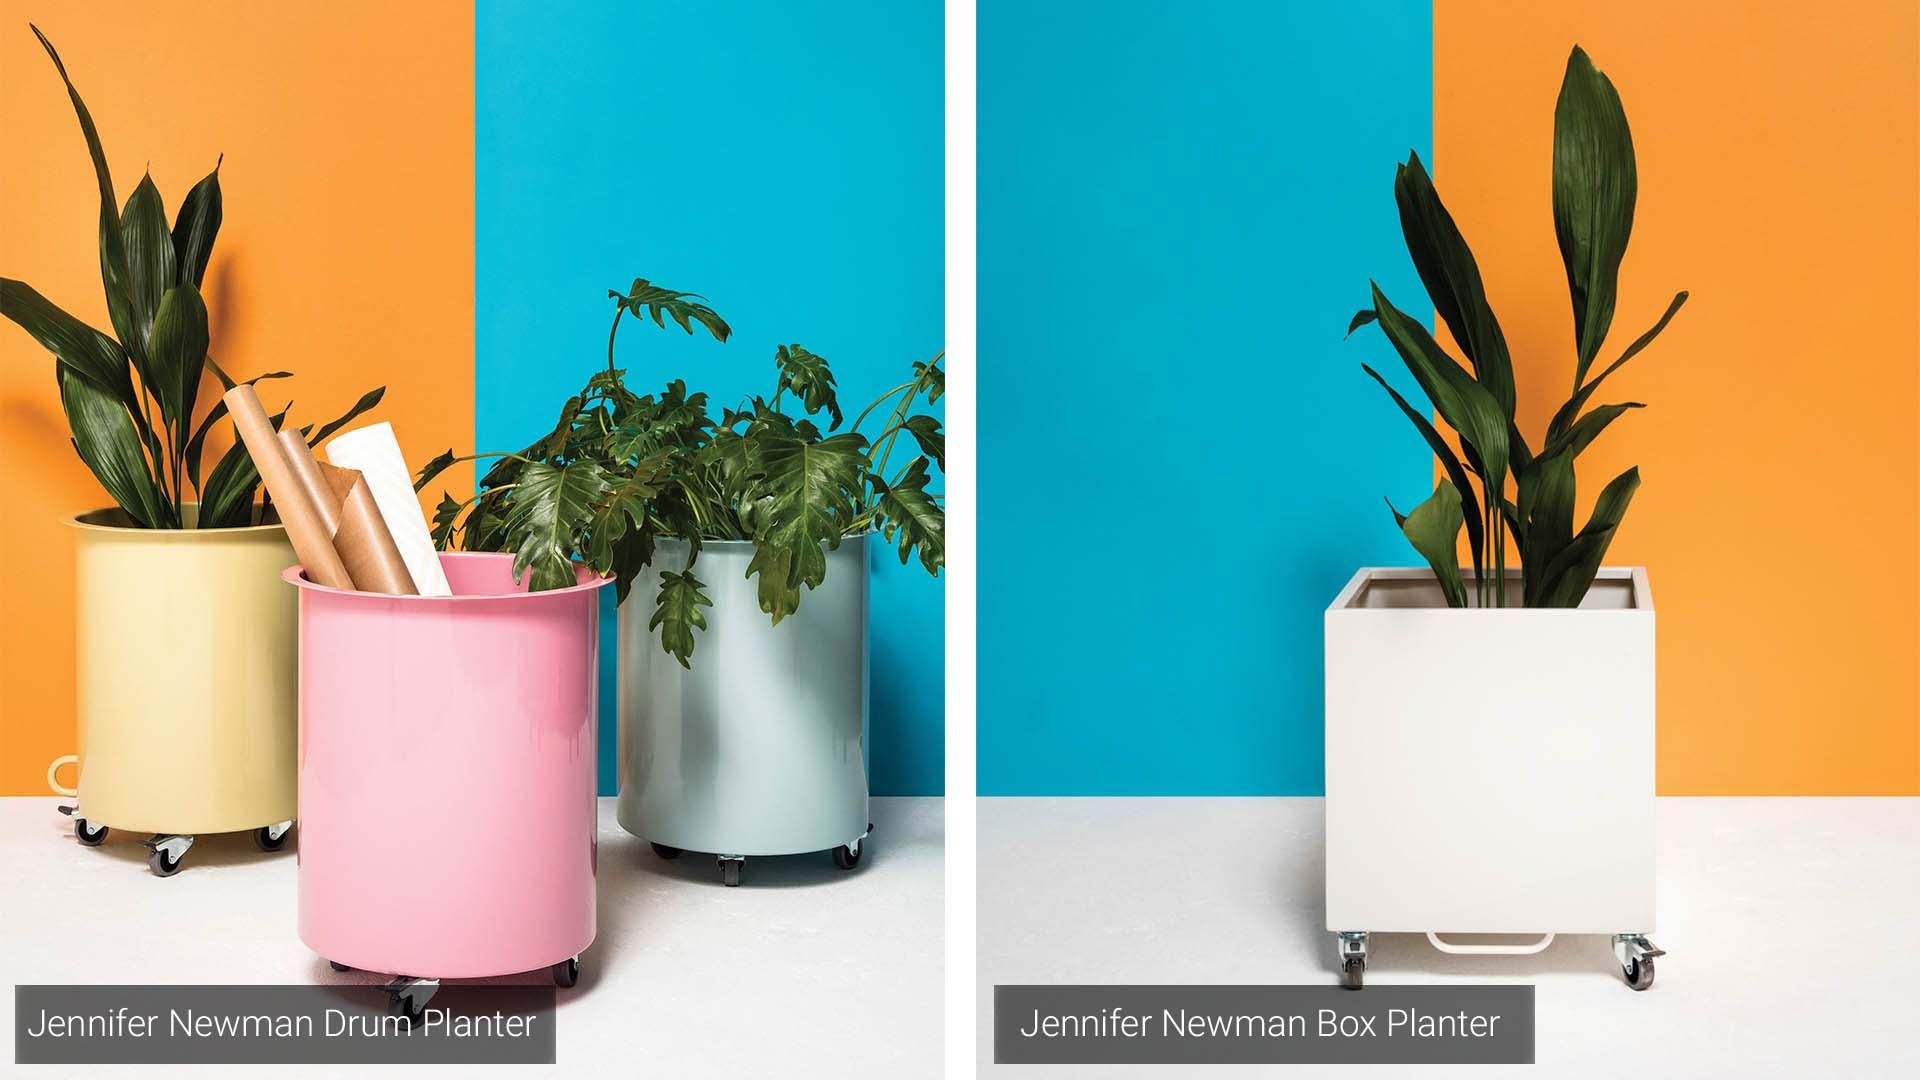 Jennifer Newman Drum & Box Planter